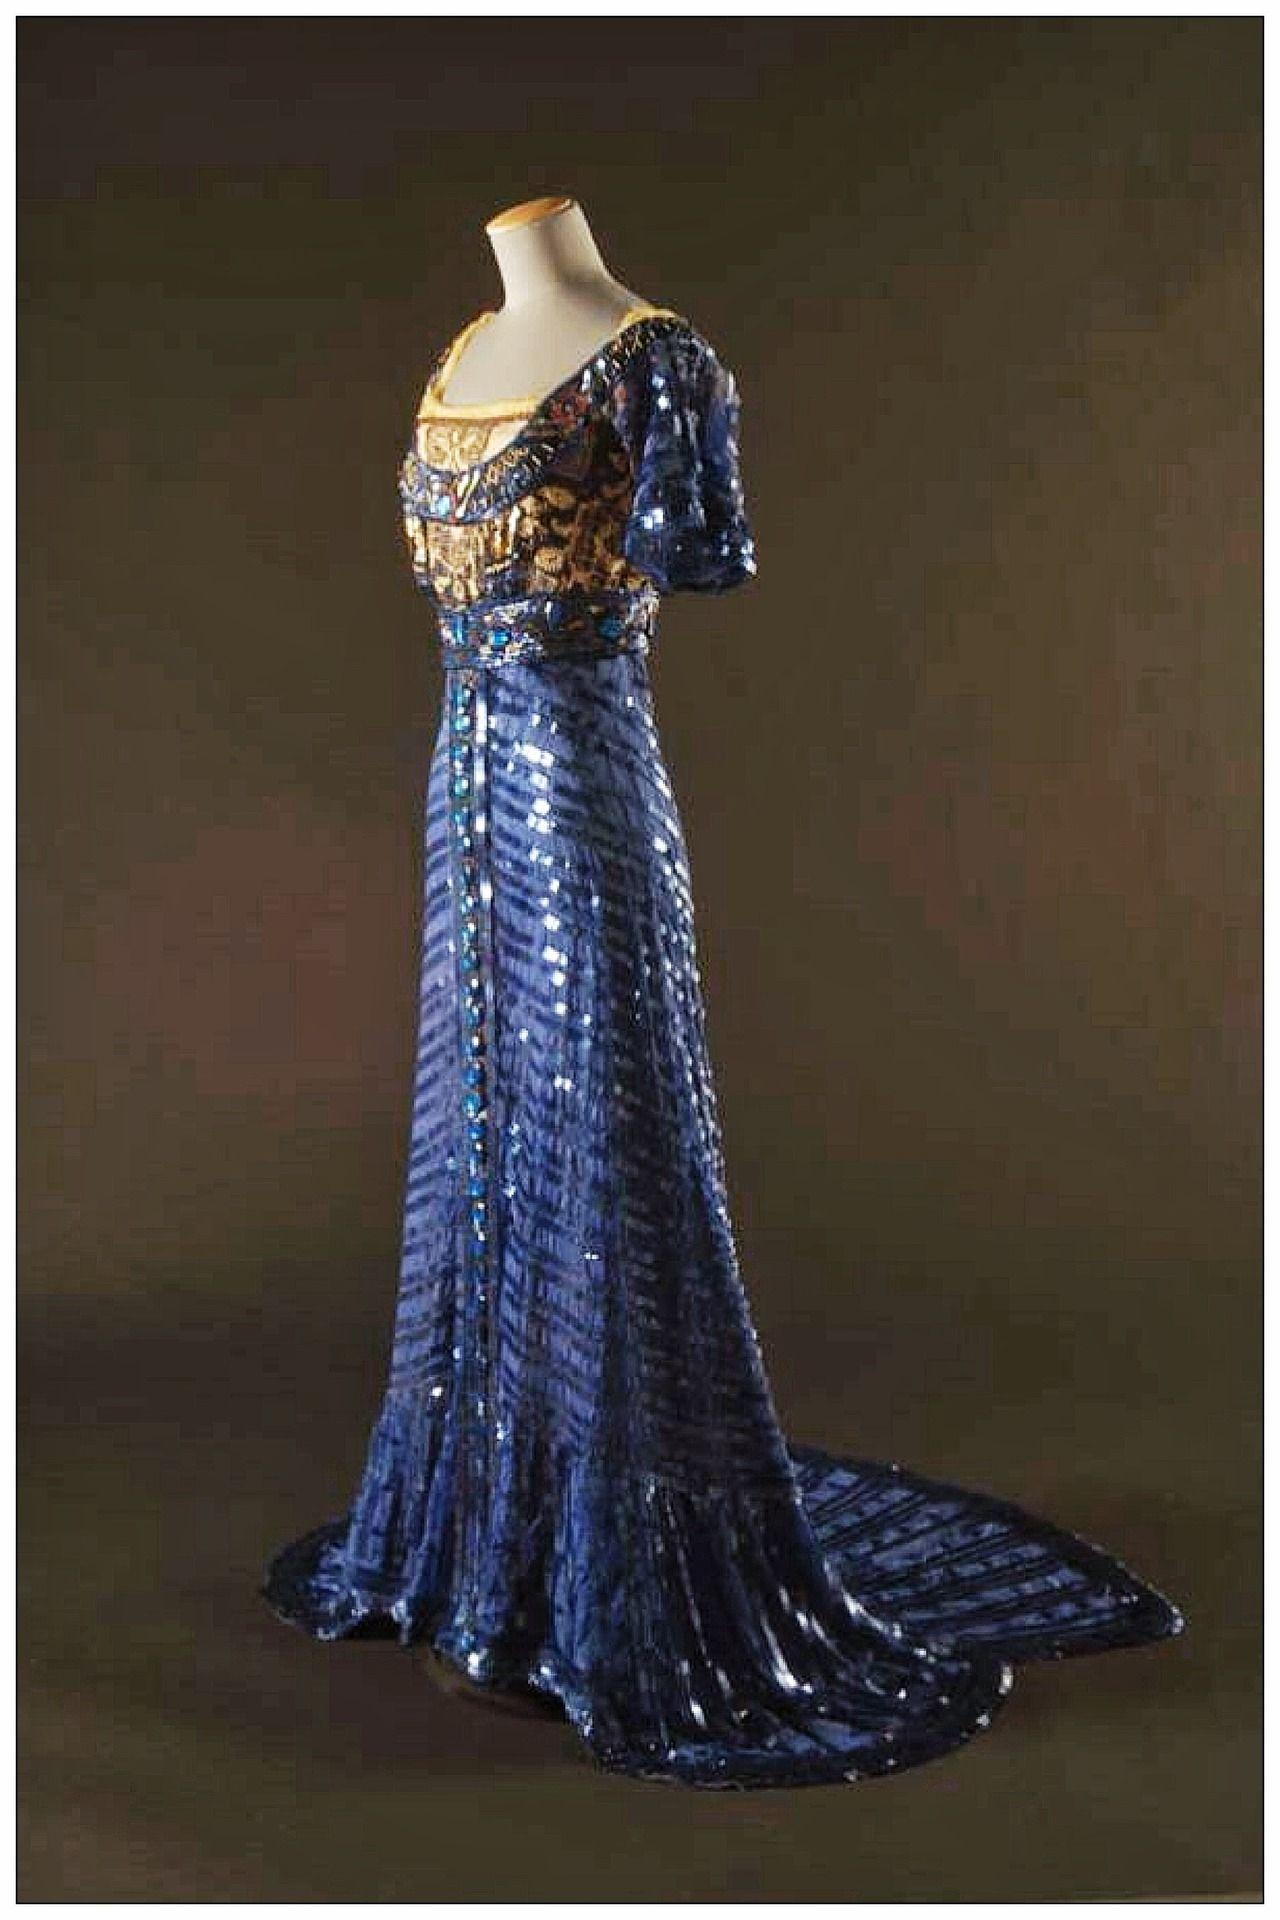 Edwardian Evening Gown